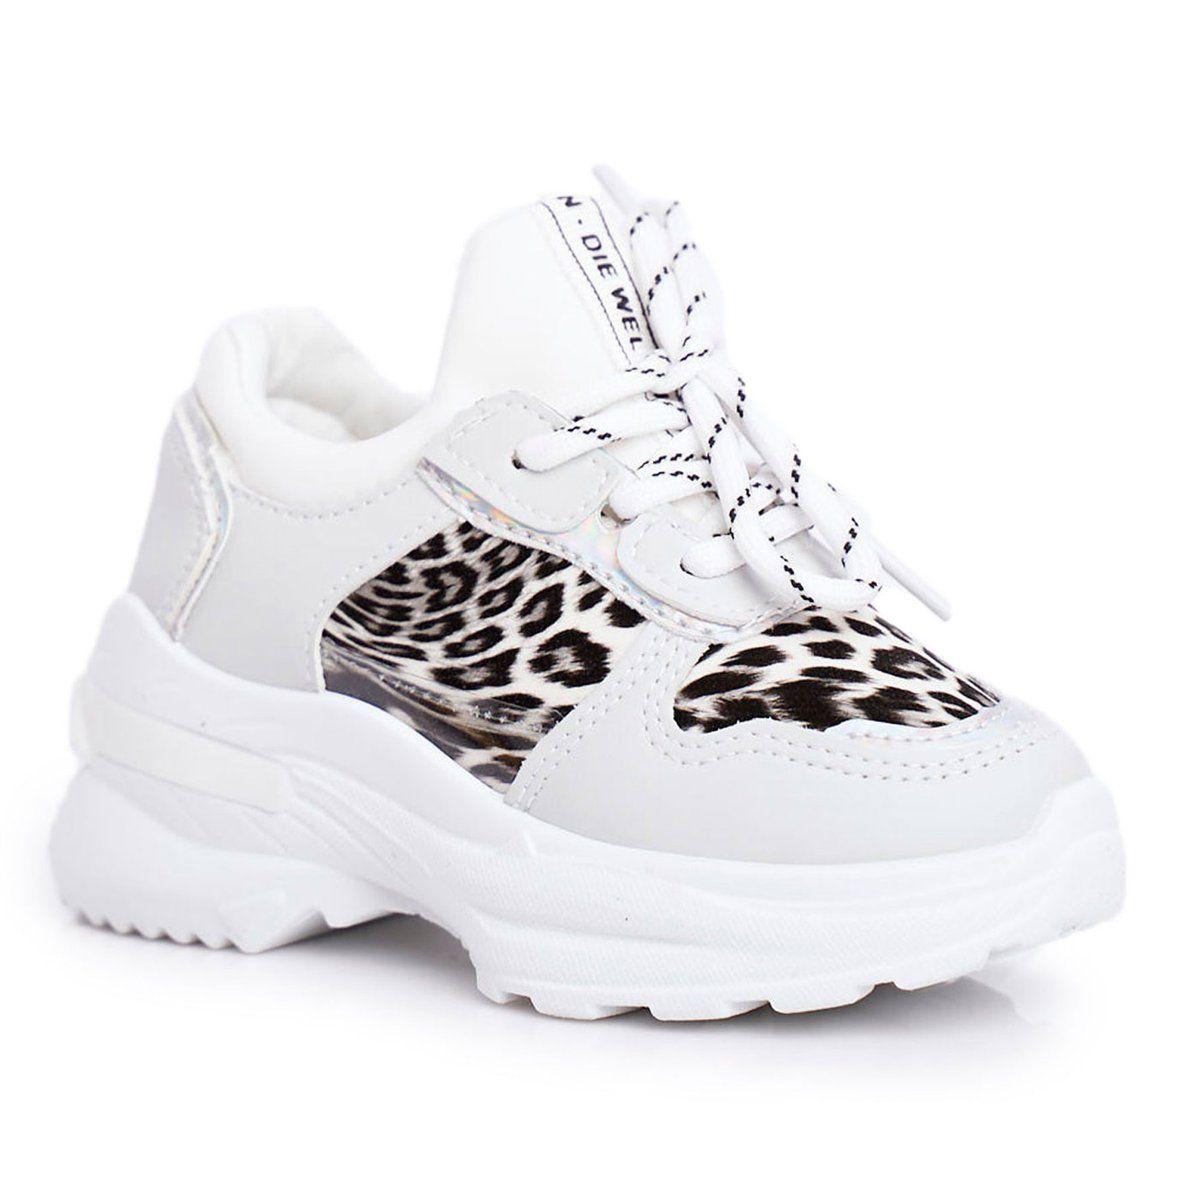 Frrock Obuwie Sportowe Dzieciece W Panterke Biale Penny Sneakers Nike Shoes Air Max Sneakers